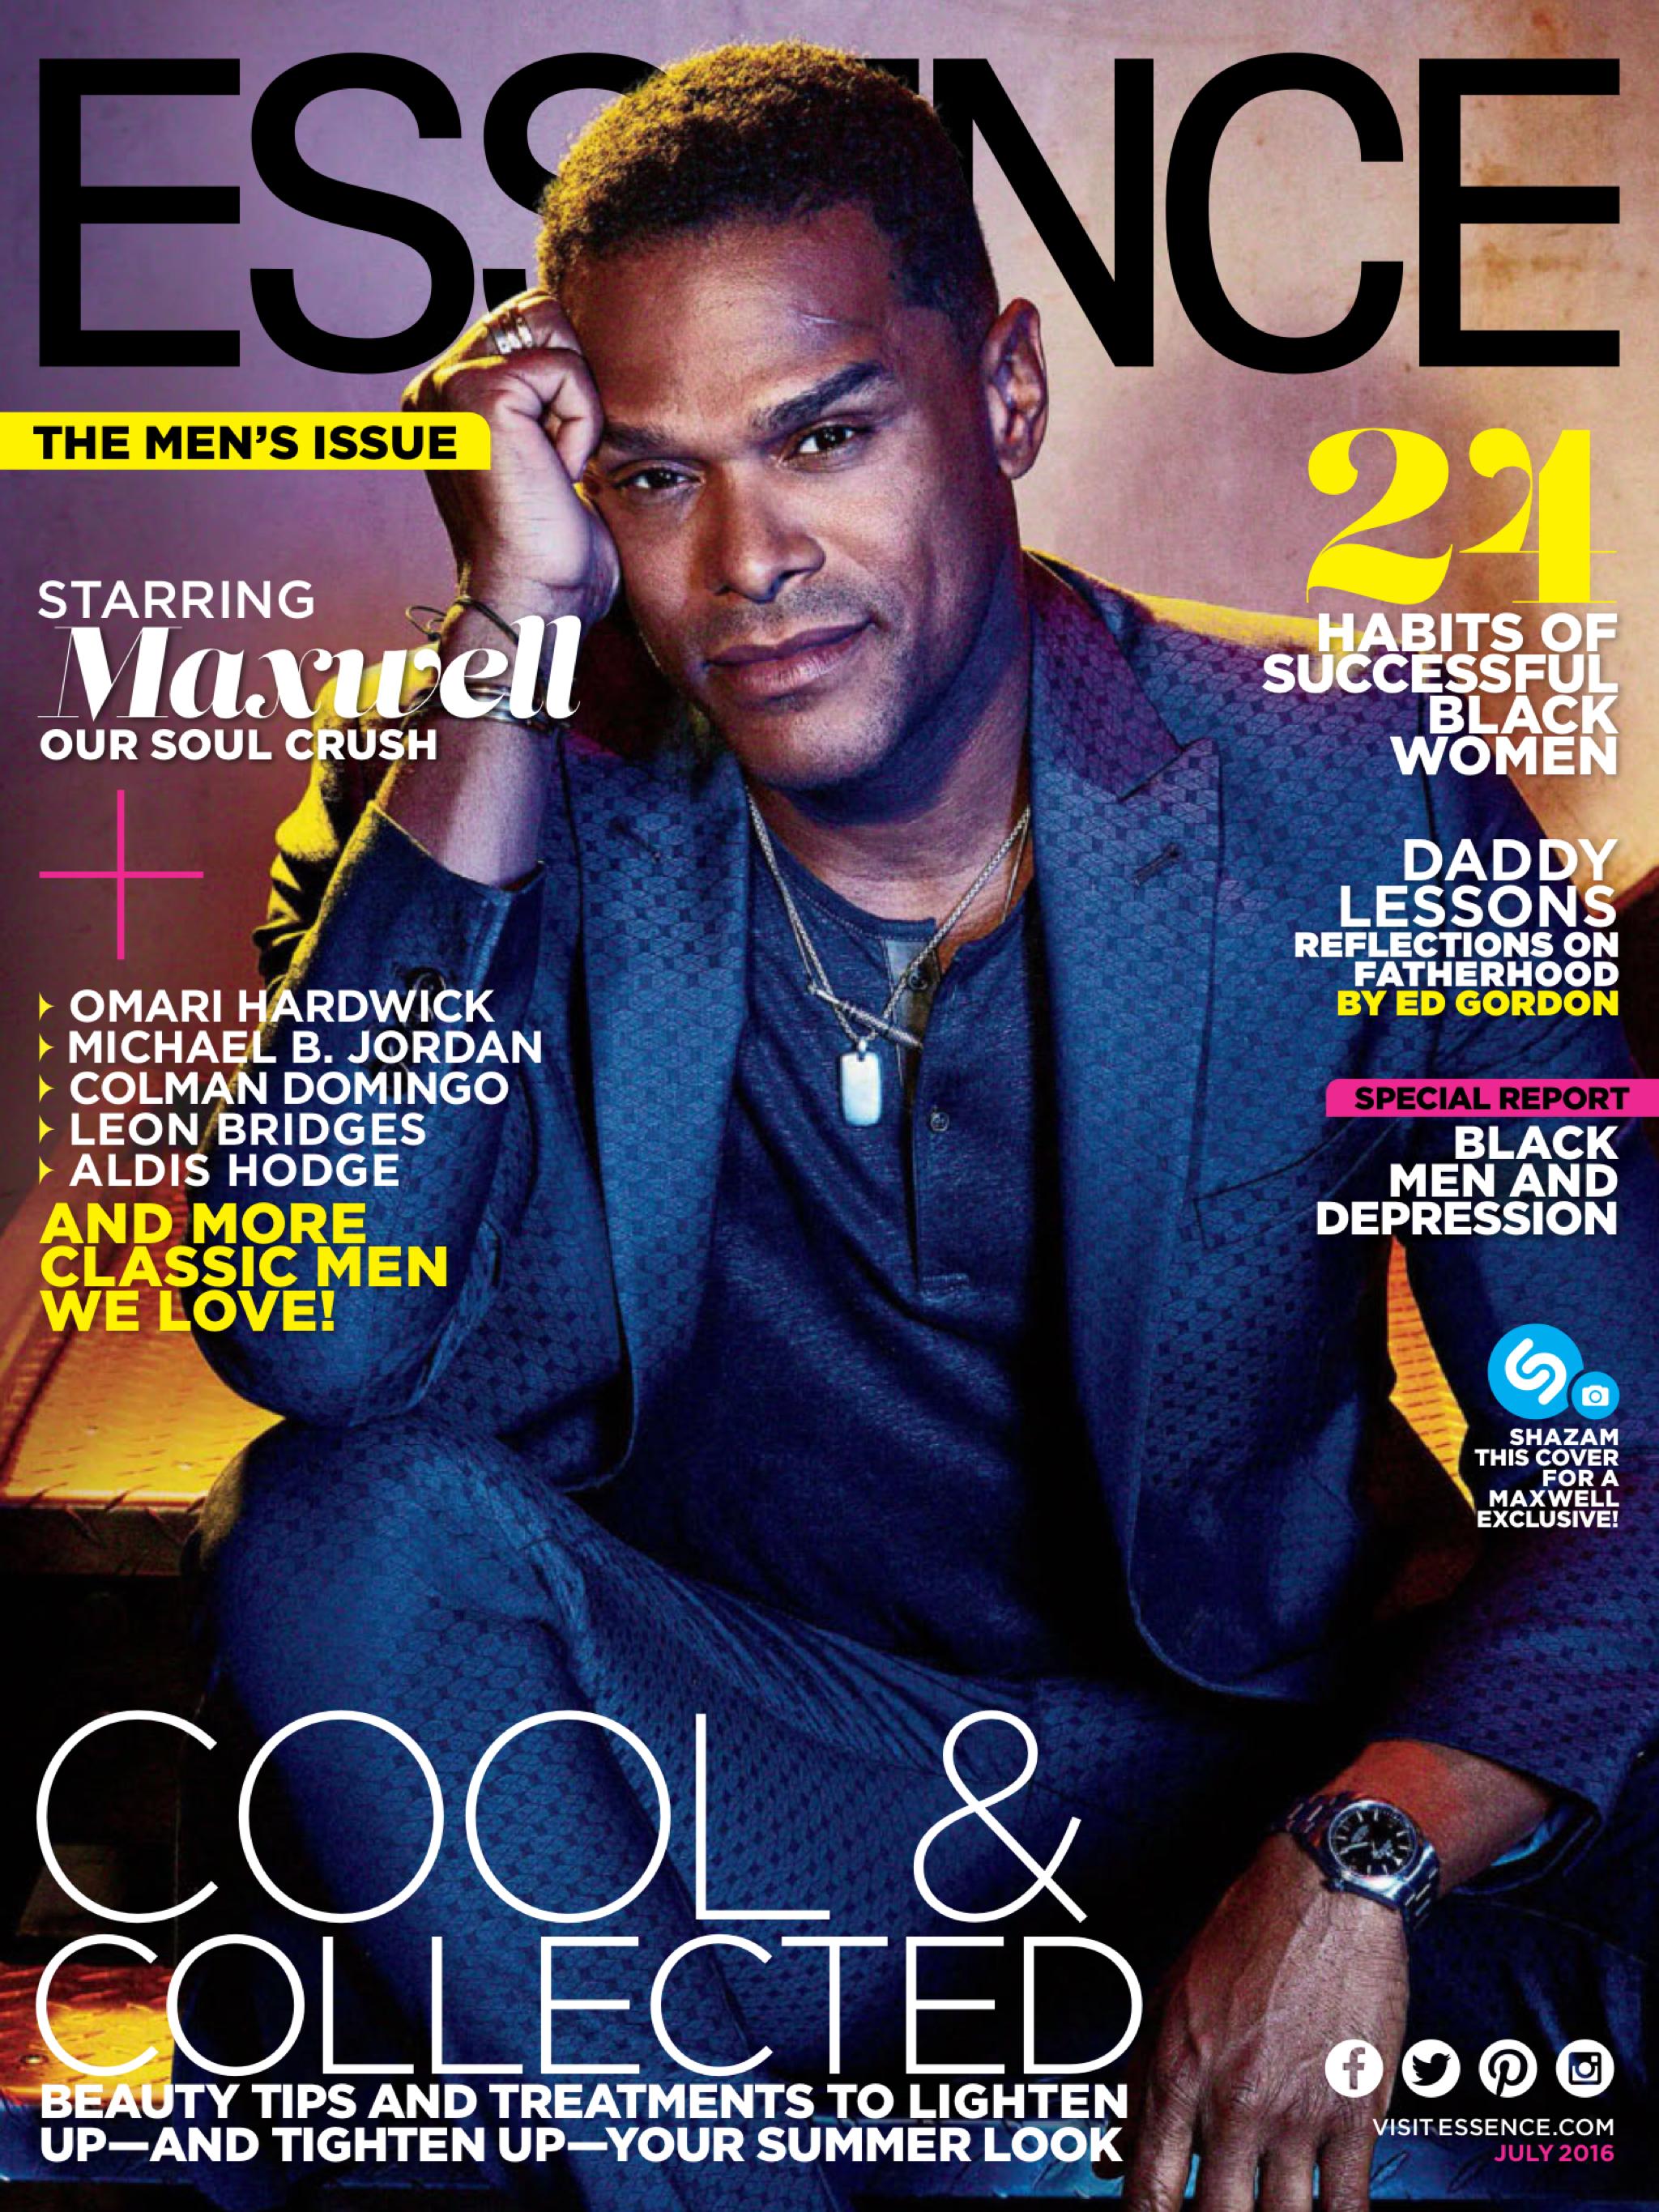 Essence Magazine July 2016 Classic Men Issue Cover | Colman Domingo